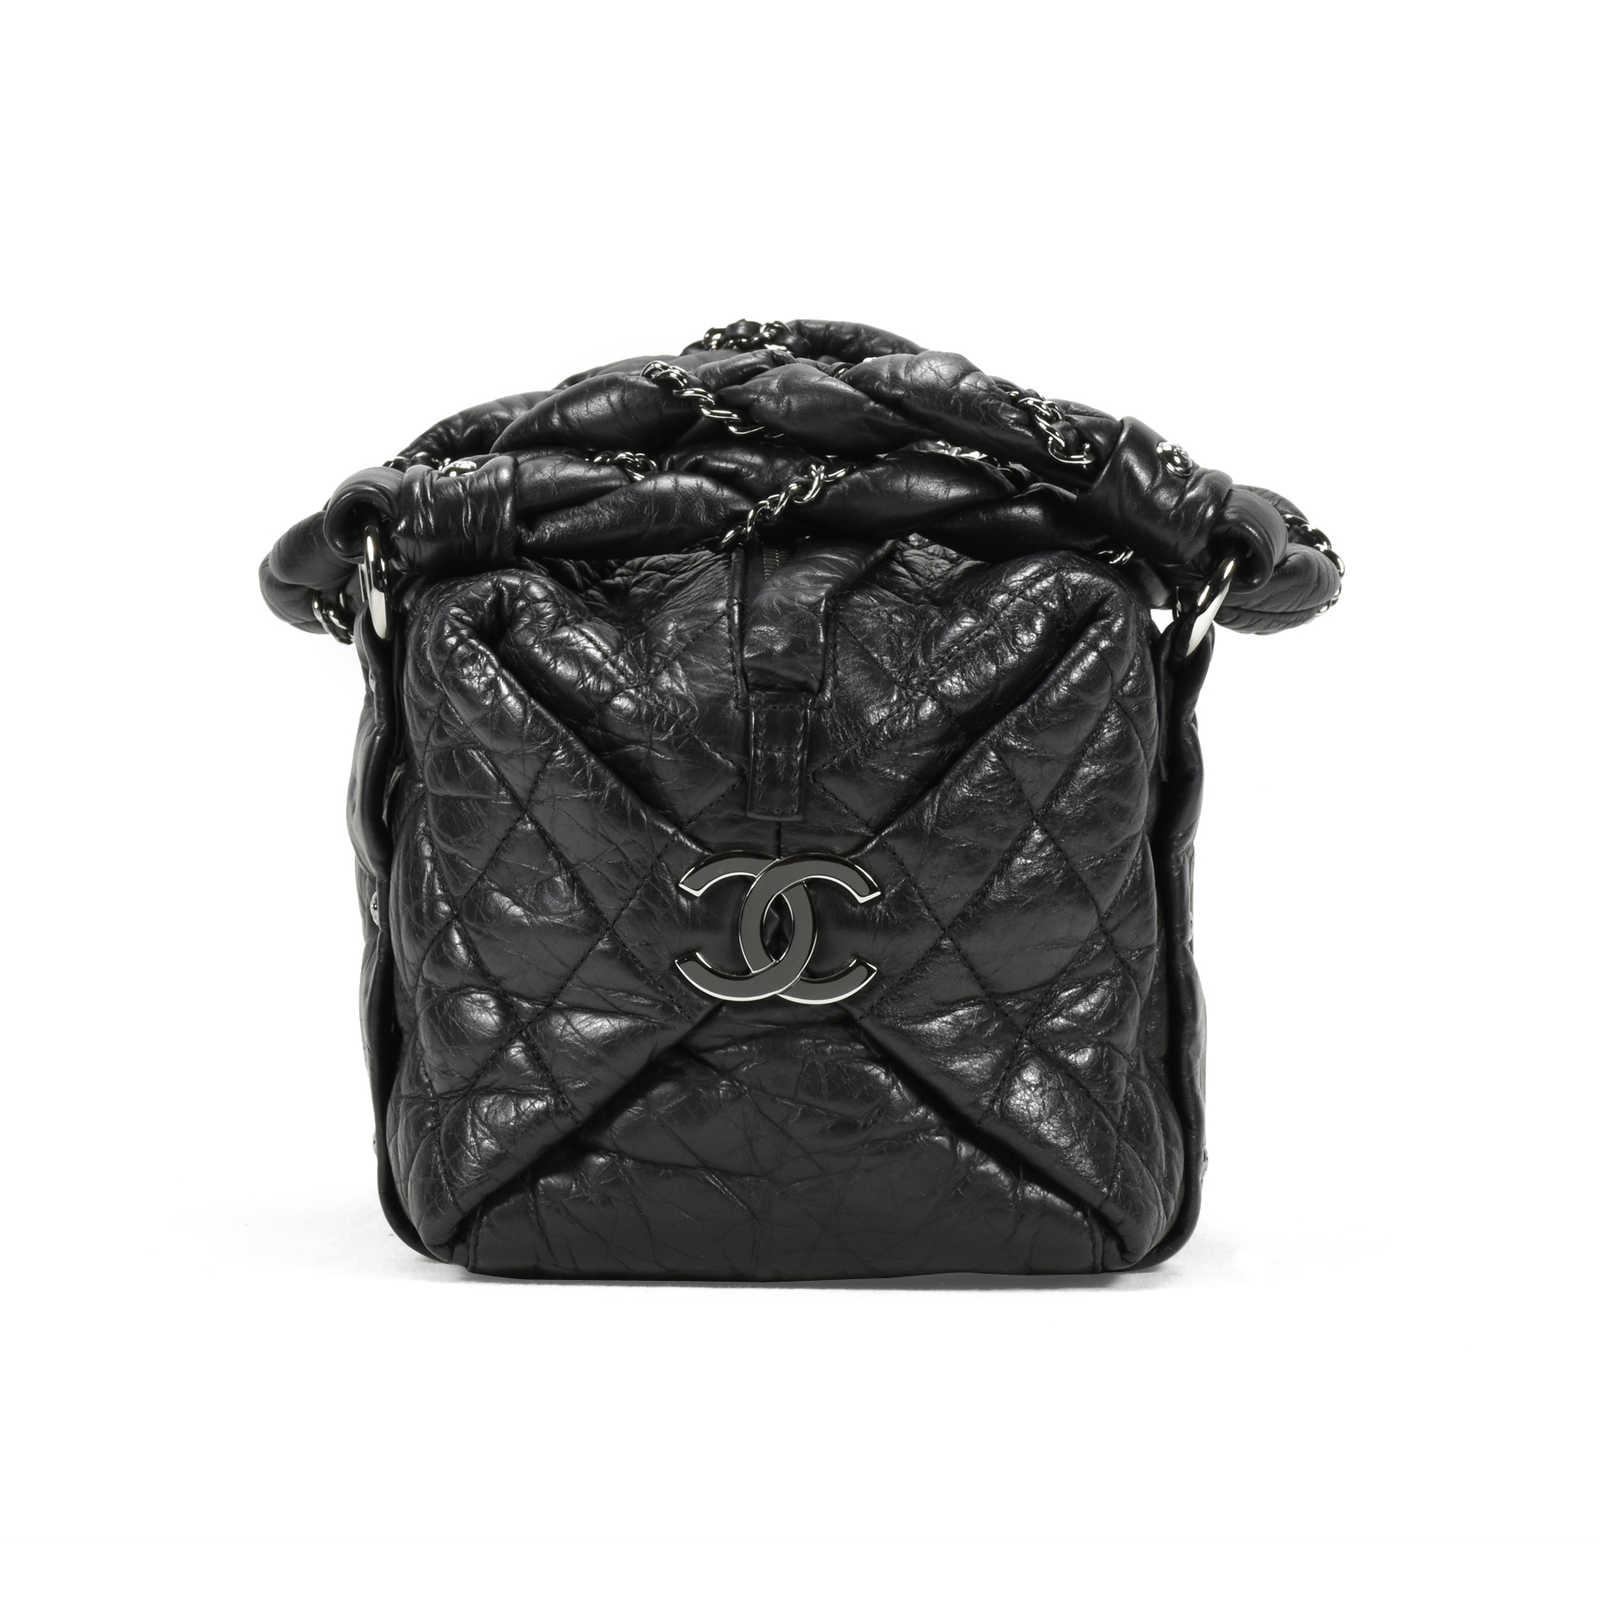 6e4abc2e45ec ... Authentic Second Hand Chanel Lady Braid Small Tote Bag (PSS-200-00898)  ...